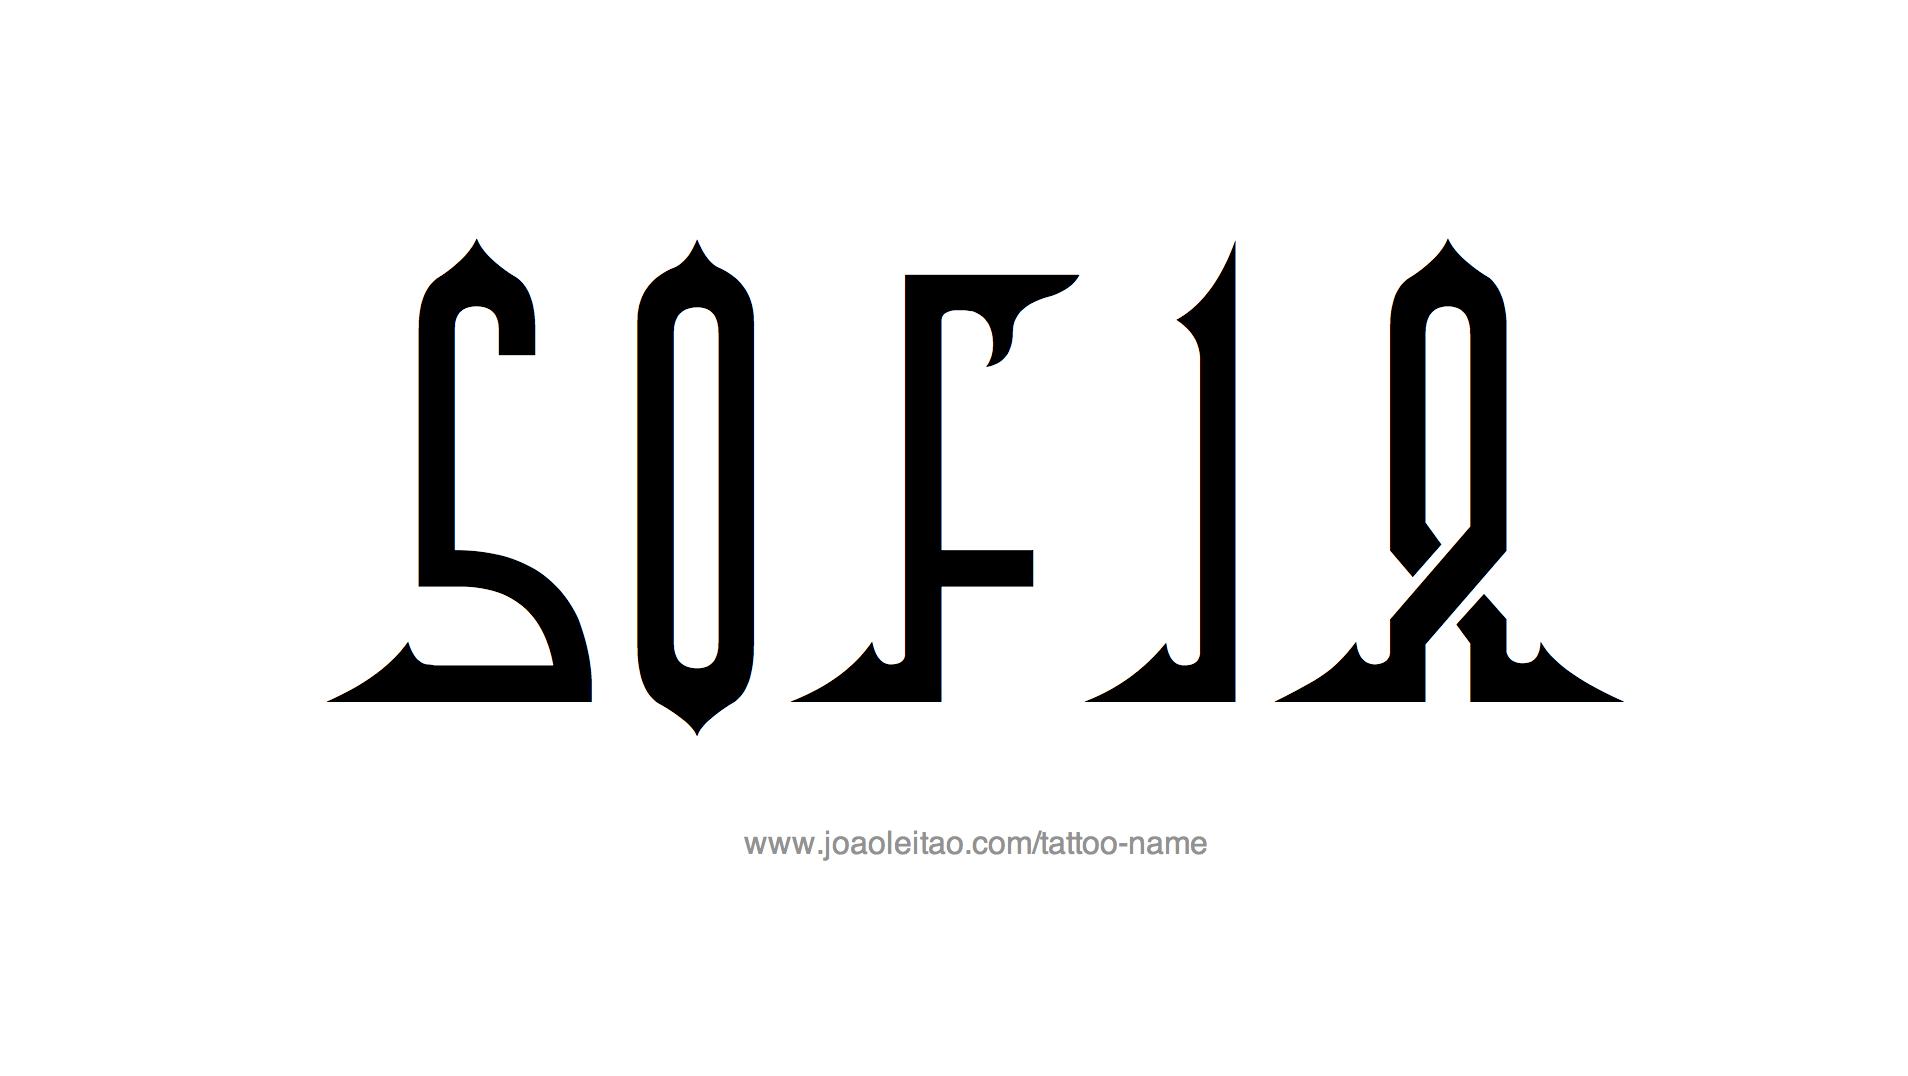 Sofia Name Tattoo Designs : tattoo design female name sofia2028129 from www.joaoleitao.com size 1908 x 1076 png 61kB